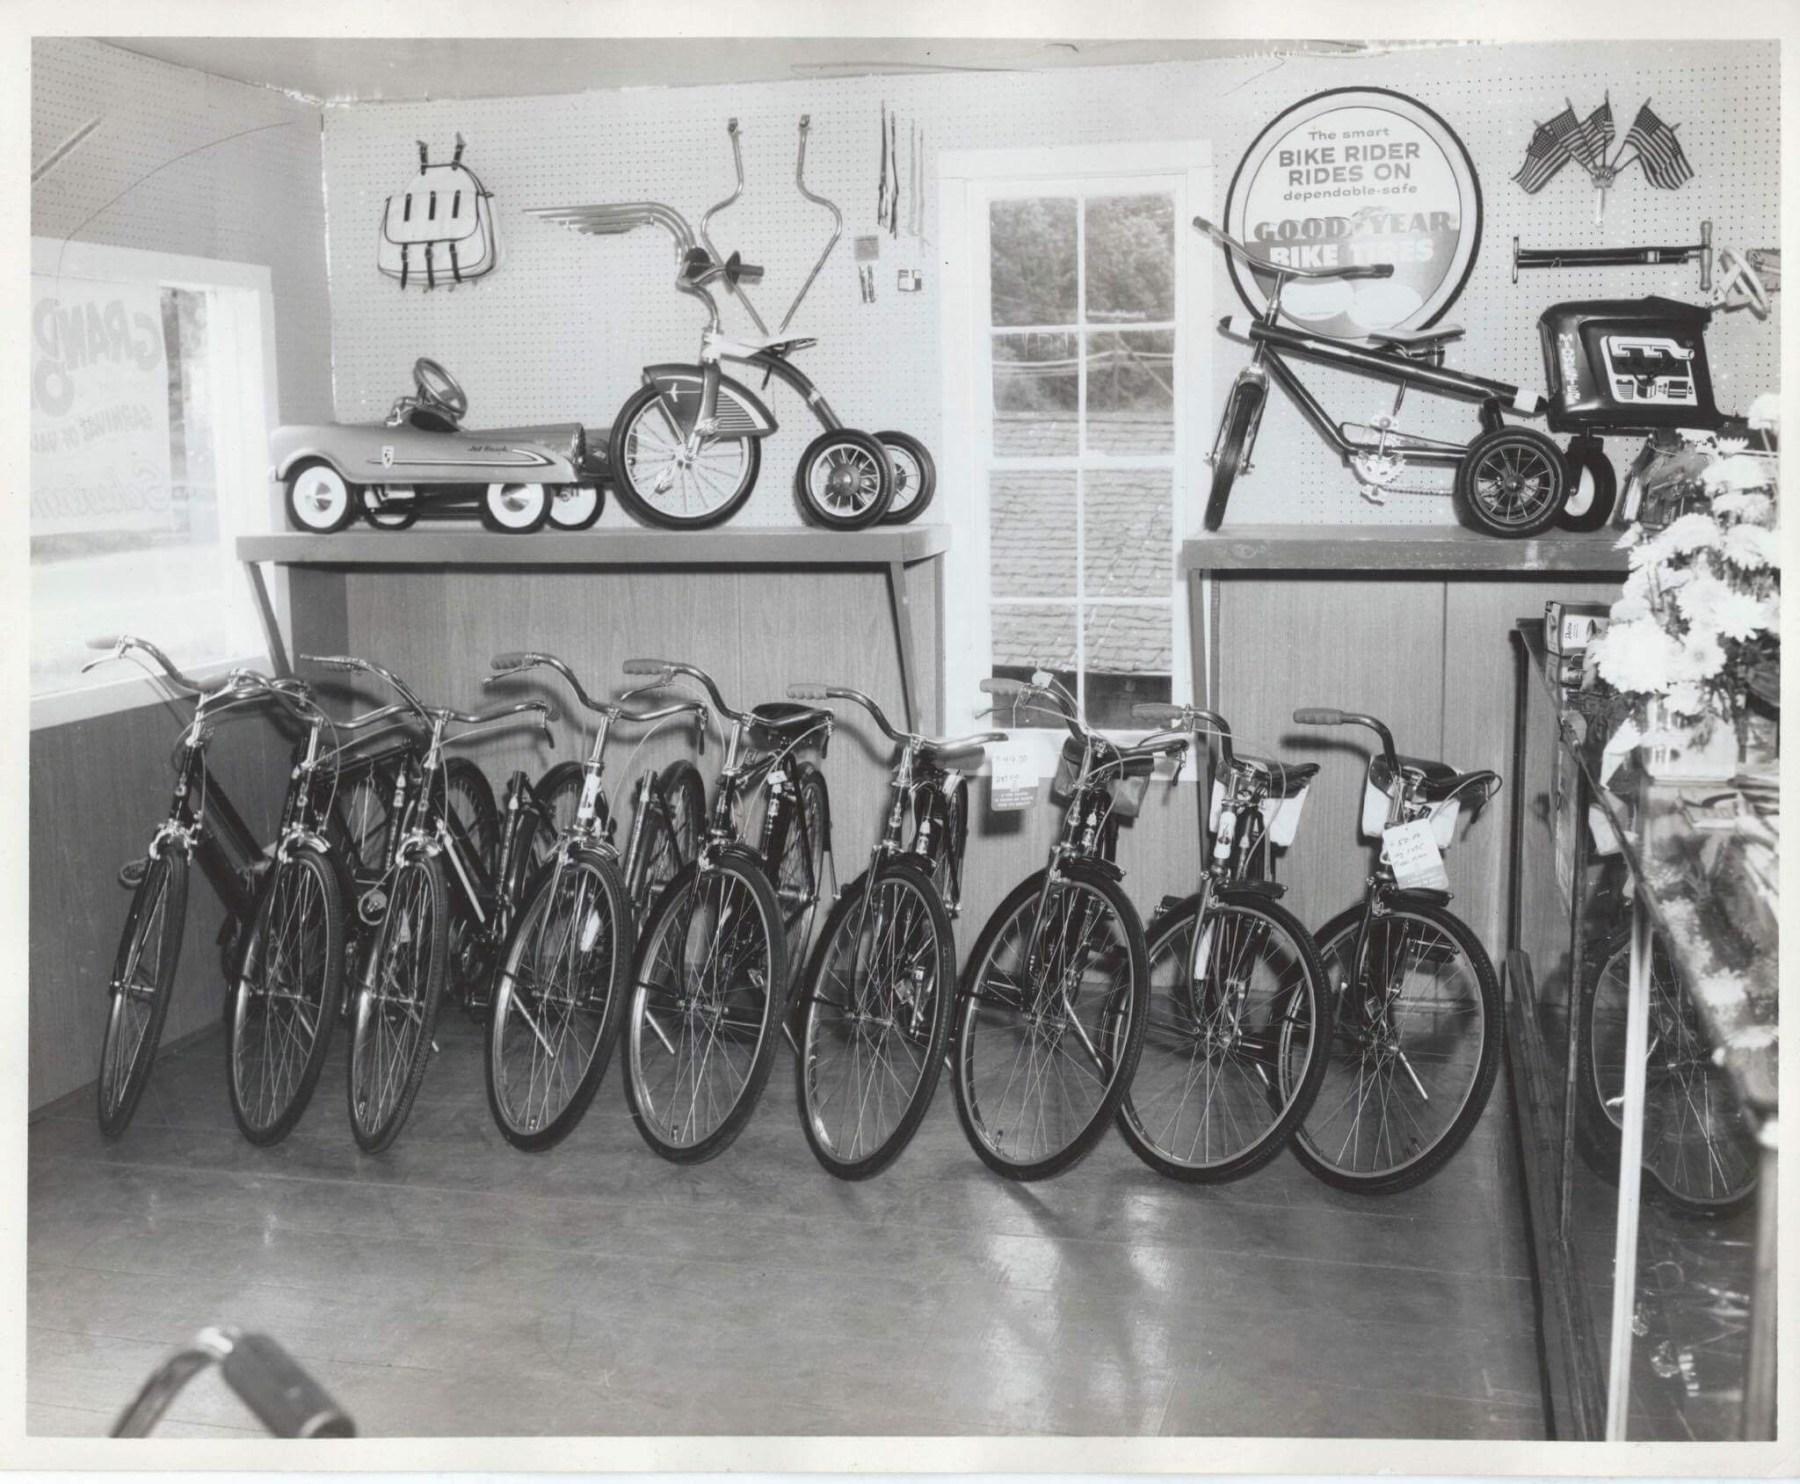 Neilsen's Bike Shop interior